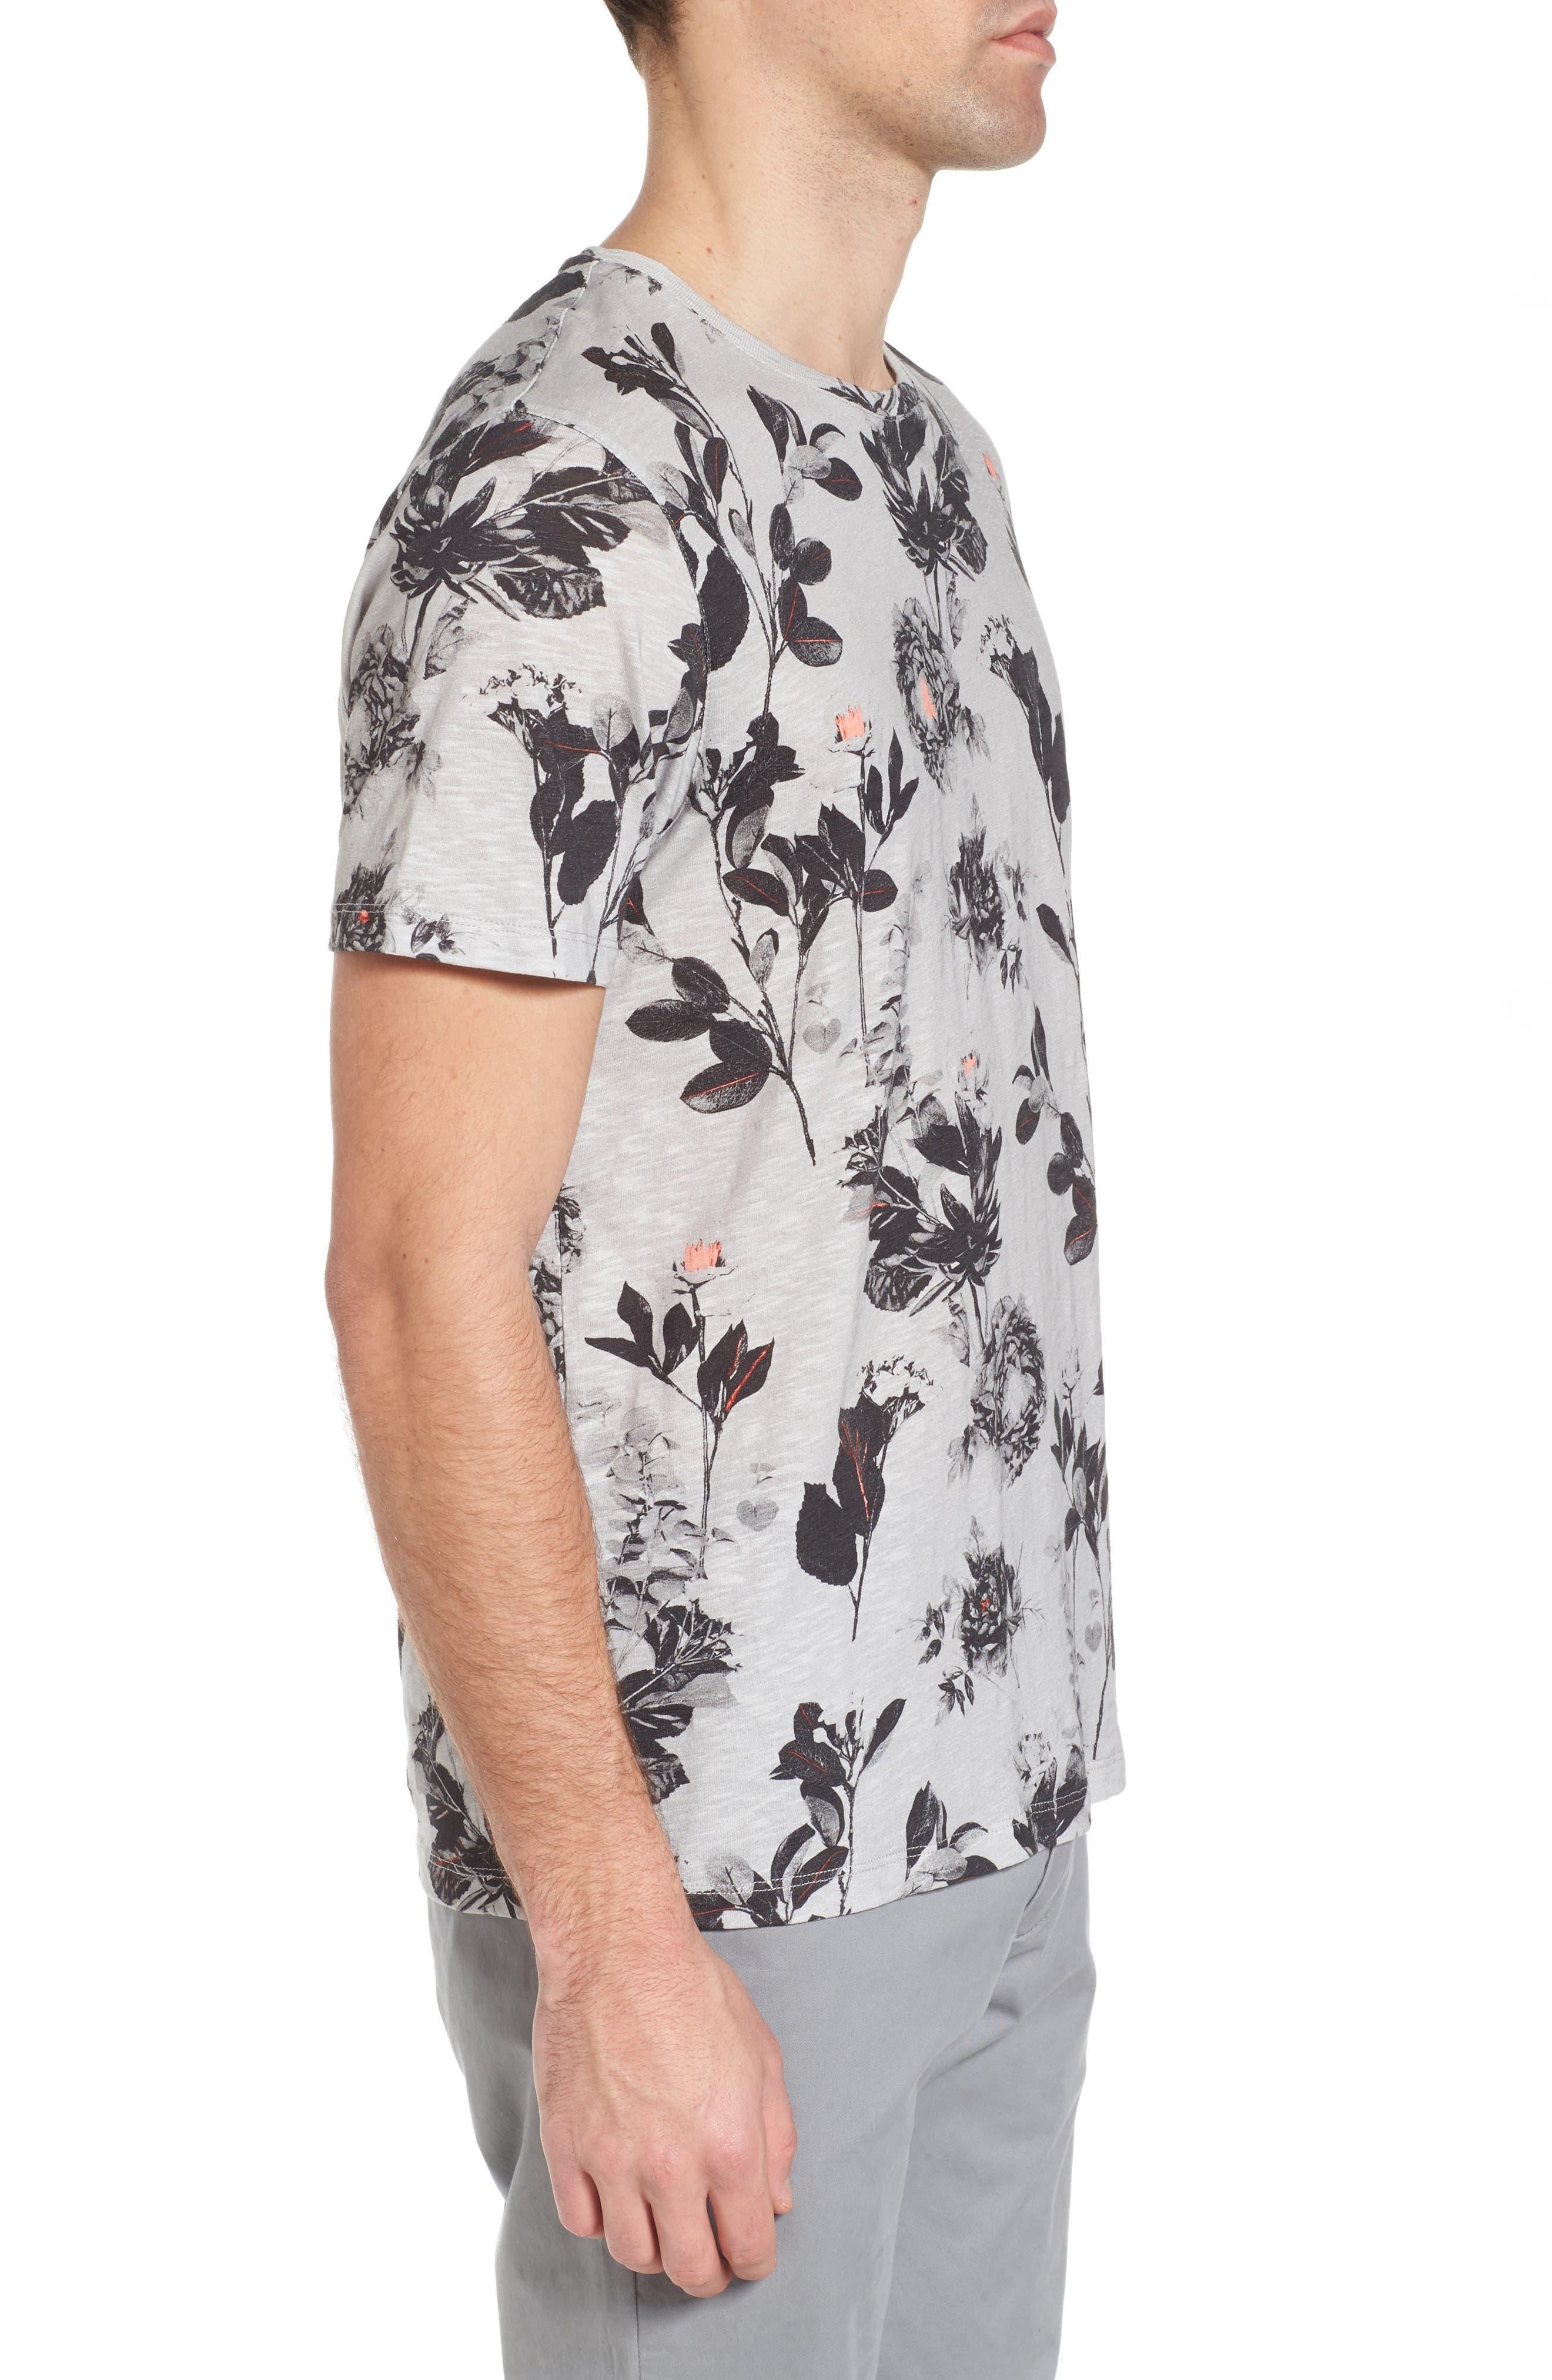 Doberma Trim Fit Floral Print T-Shirt,                             Alternate thumbnail 3, color,                             Grey